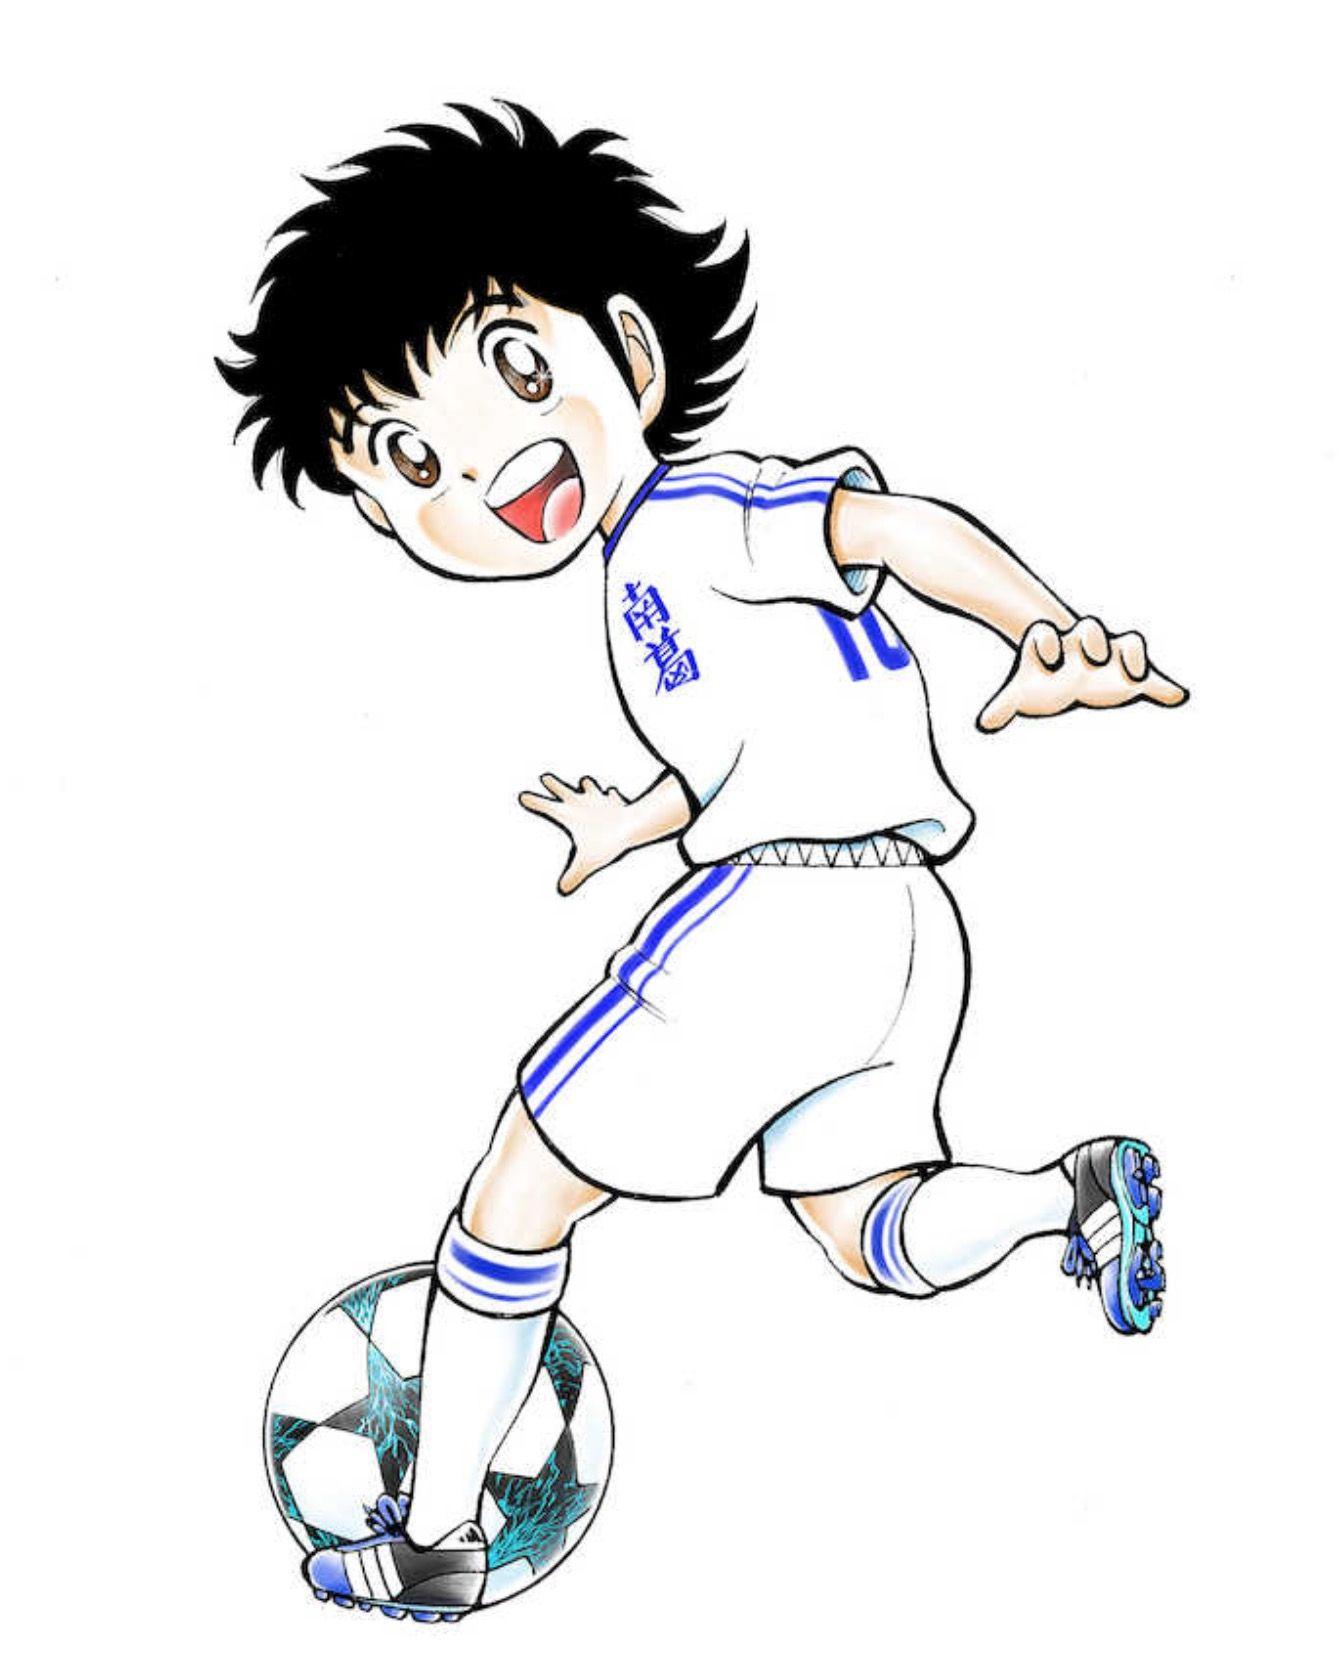 Captain_Tsubasa_Kids_Dream_visual_1